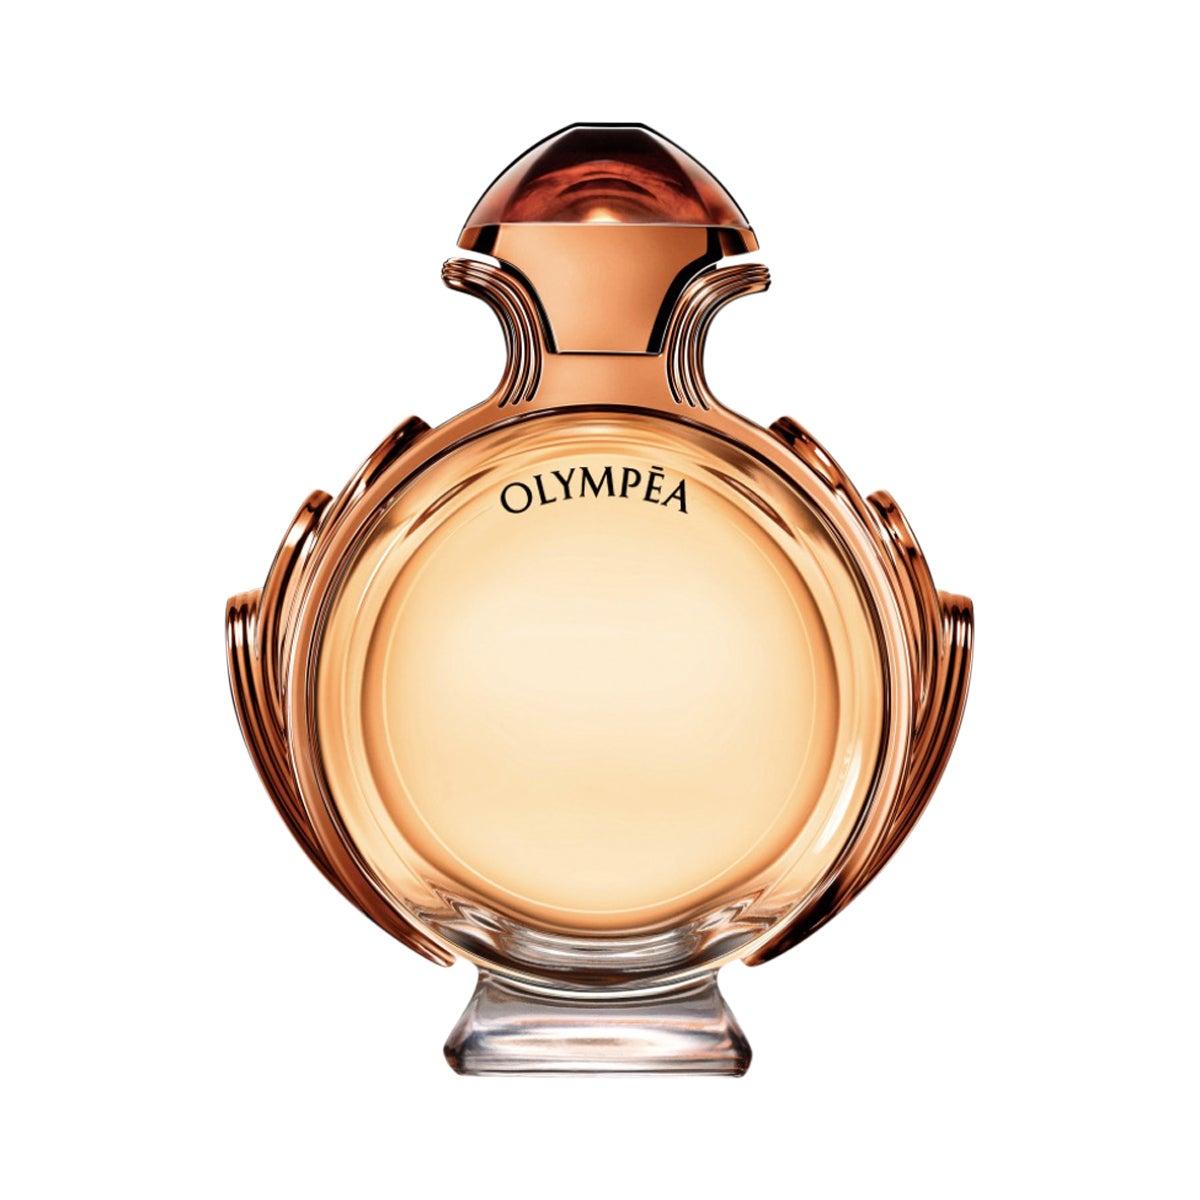 Paco Rabanne Olympea Intense Women's Perfume